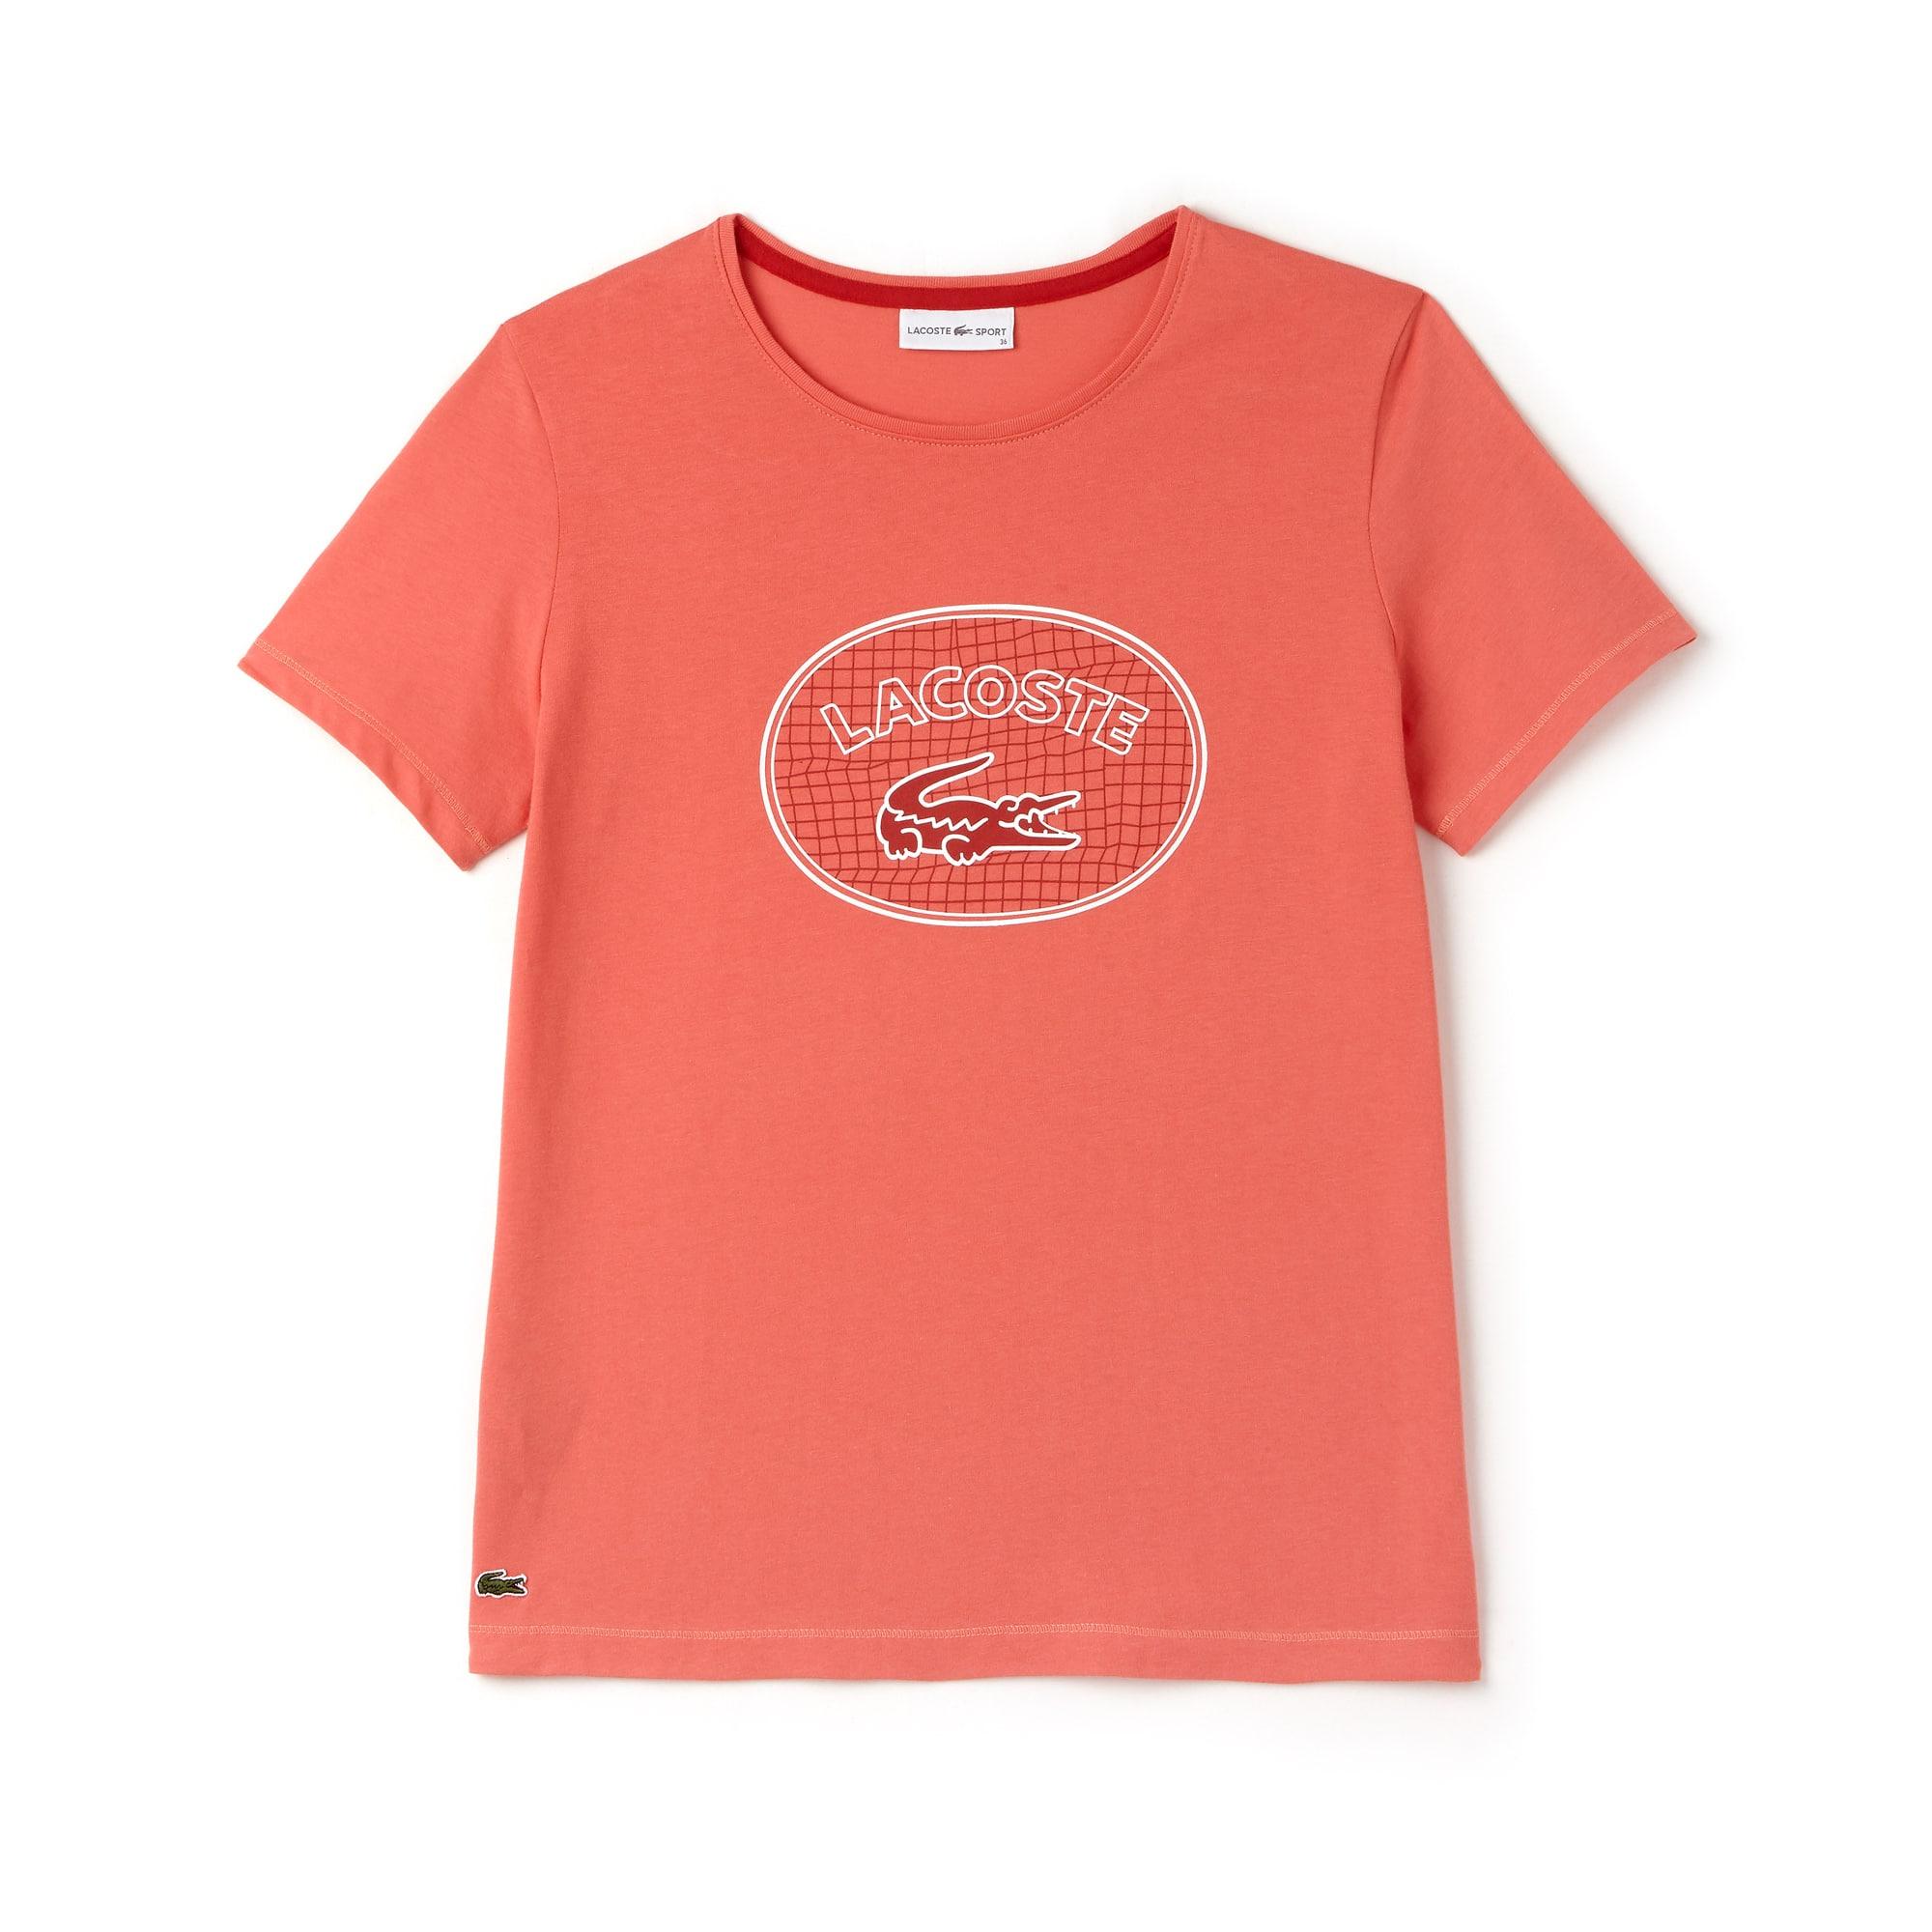 Lacoste SPORT Tennis-T-shirt dames jersey met oversized logo